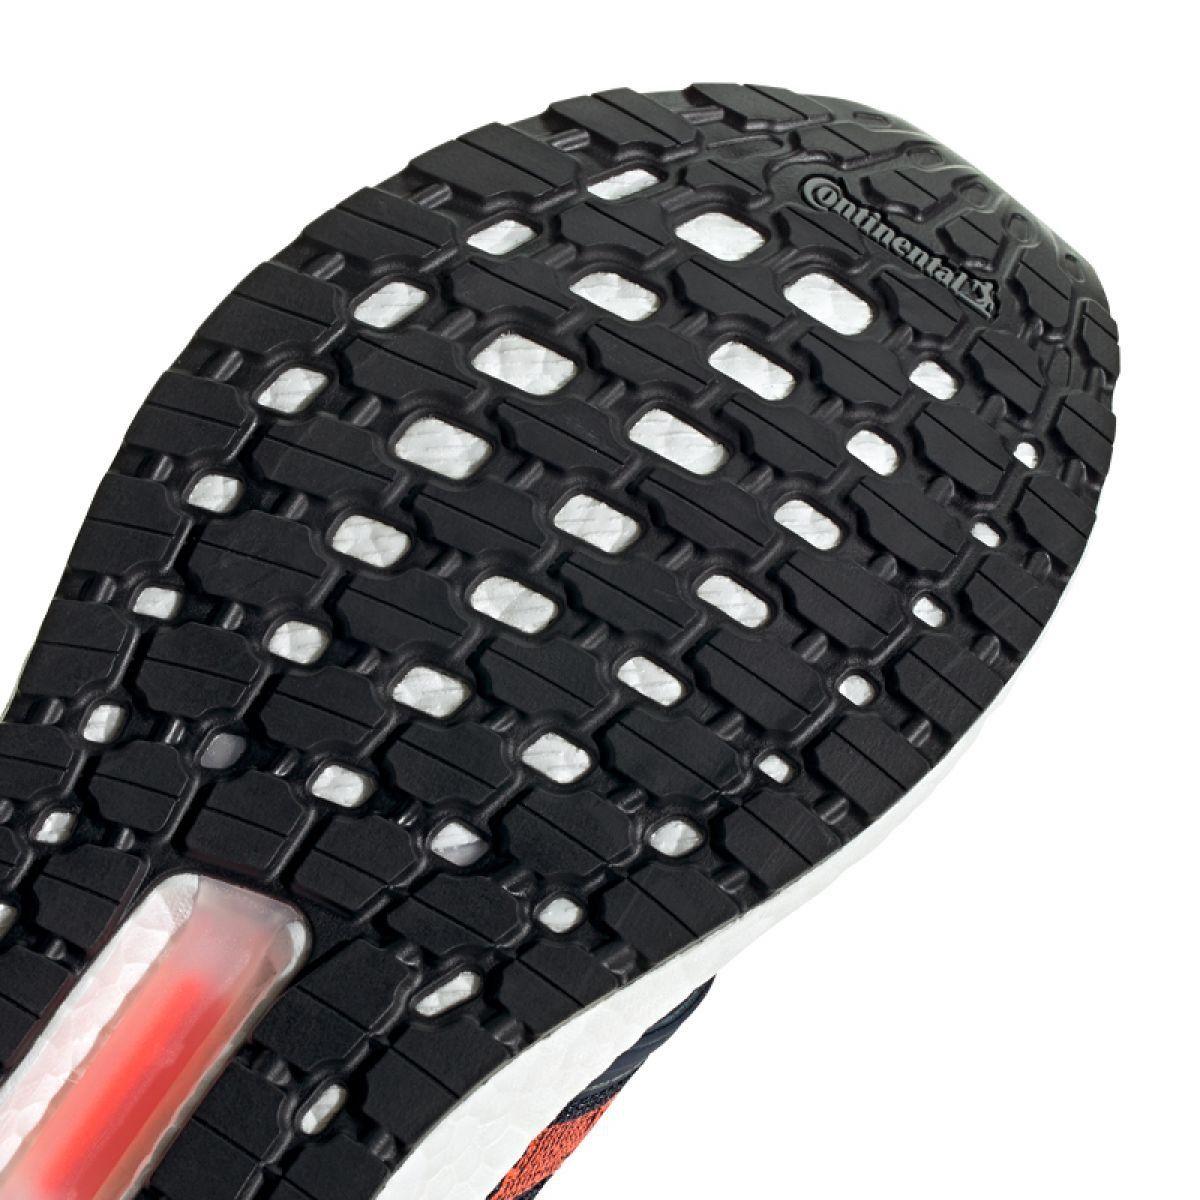 Buty Adidas Ultraboost 20 M Eg0693 Granatowe In 2020 Adidas Ultra Boost Shoes Sneakers Adidas Adidas Men